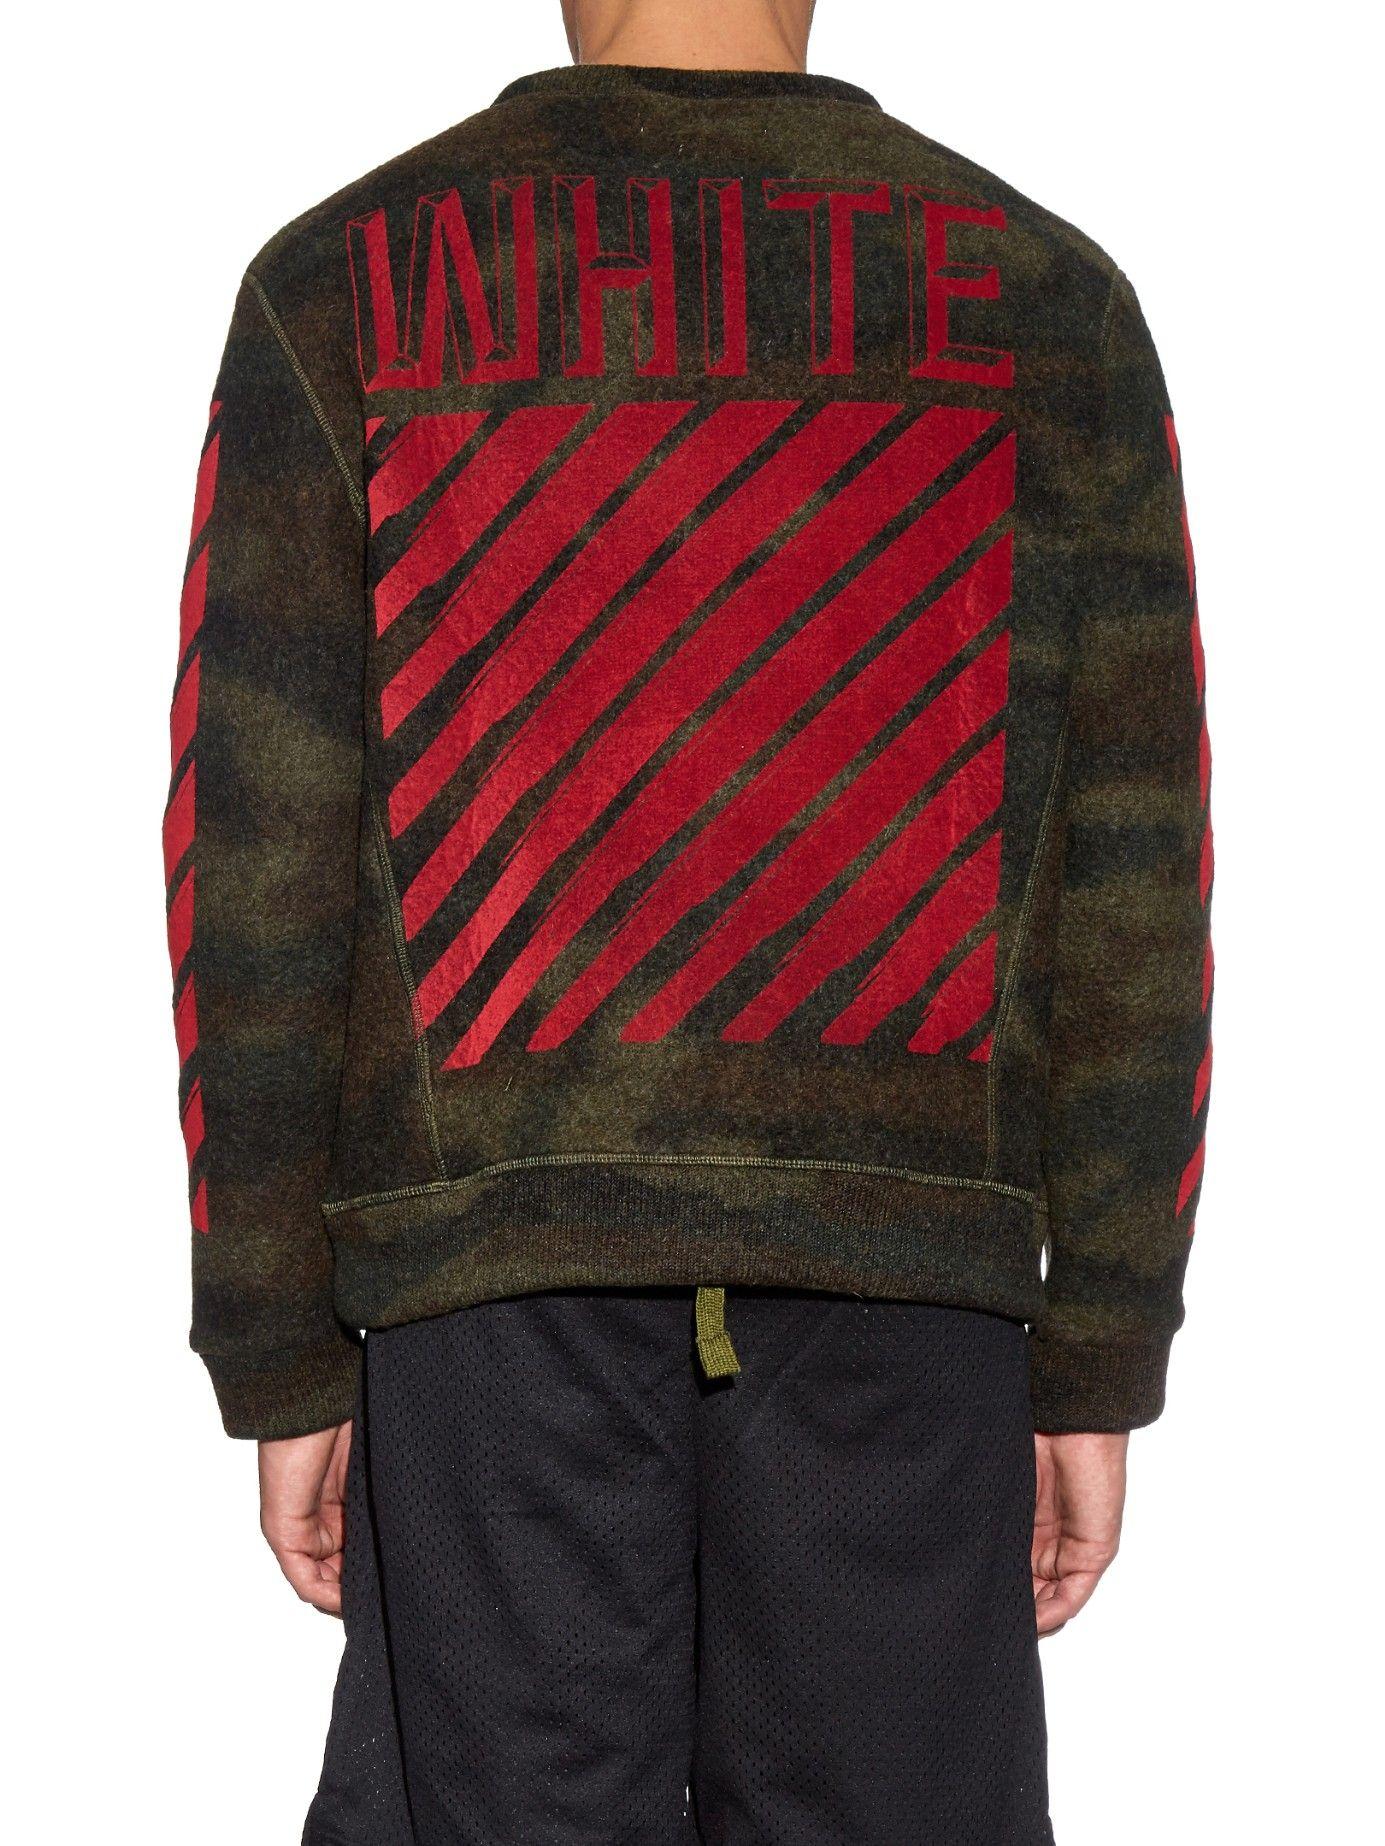 Camouflage Print Felt Sweatshirt Off White Matchesfashion Com Us Camouflage Sweatshirts Off White [ 1846 x 1385 Pixel ]